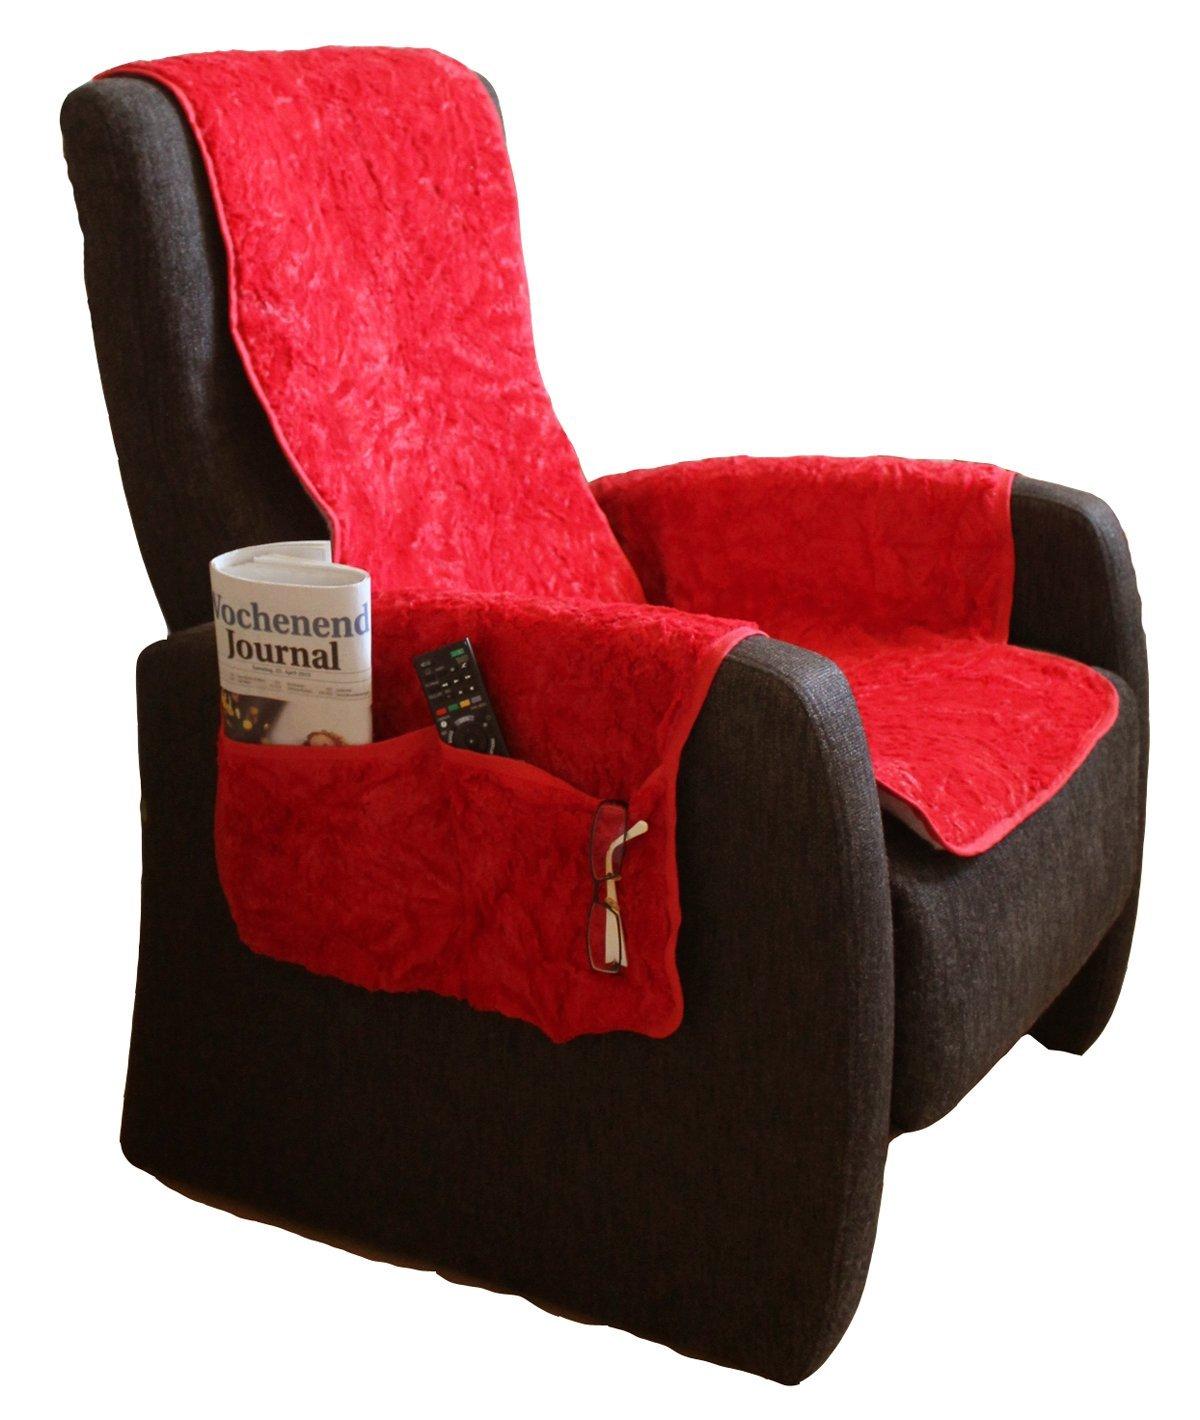 sesselschoner f r fernsehsessel 5 tolle artikel im vergleich. Black Bedroom Furniture Sets. Home Design Ideas